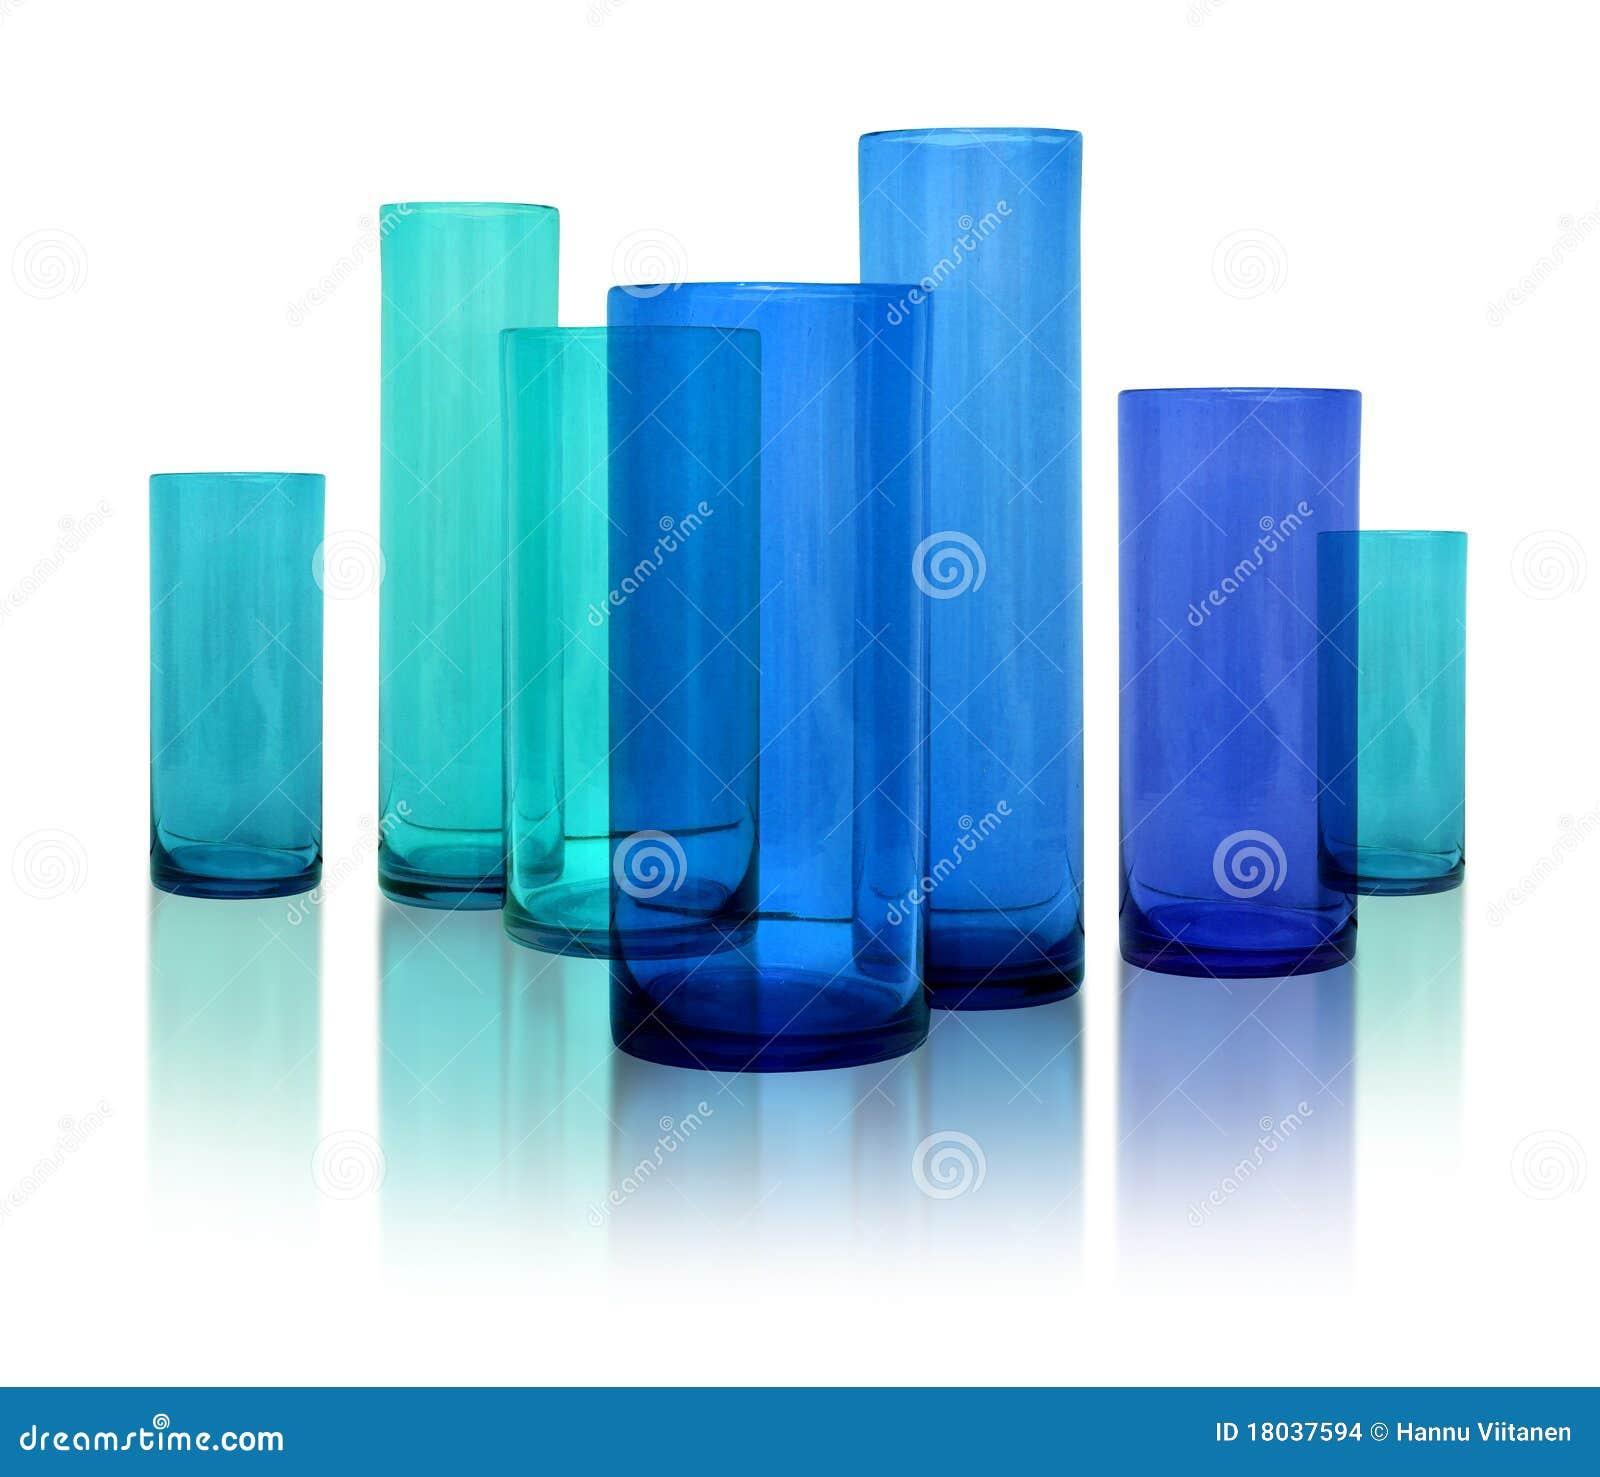 Modern blue glass vases stock photo image of height 18037594 modern blue glass vases reviewsmspy